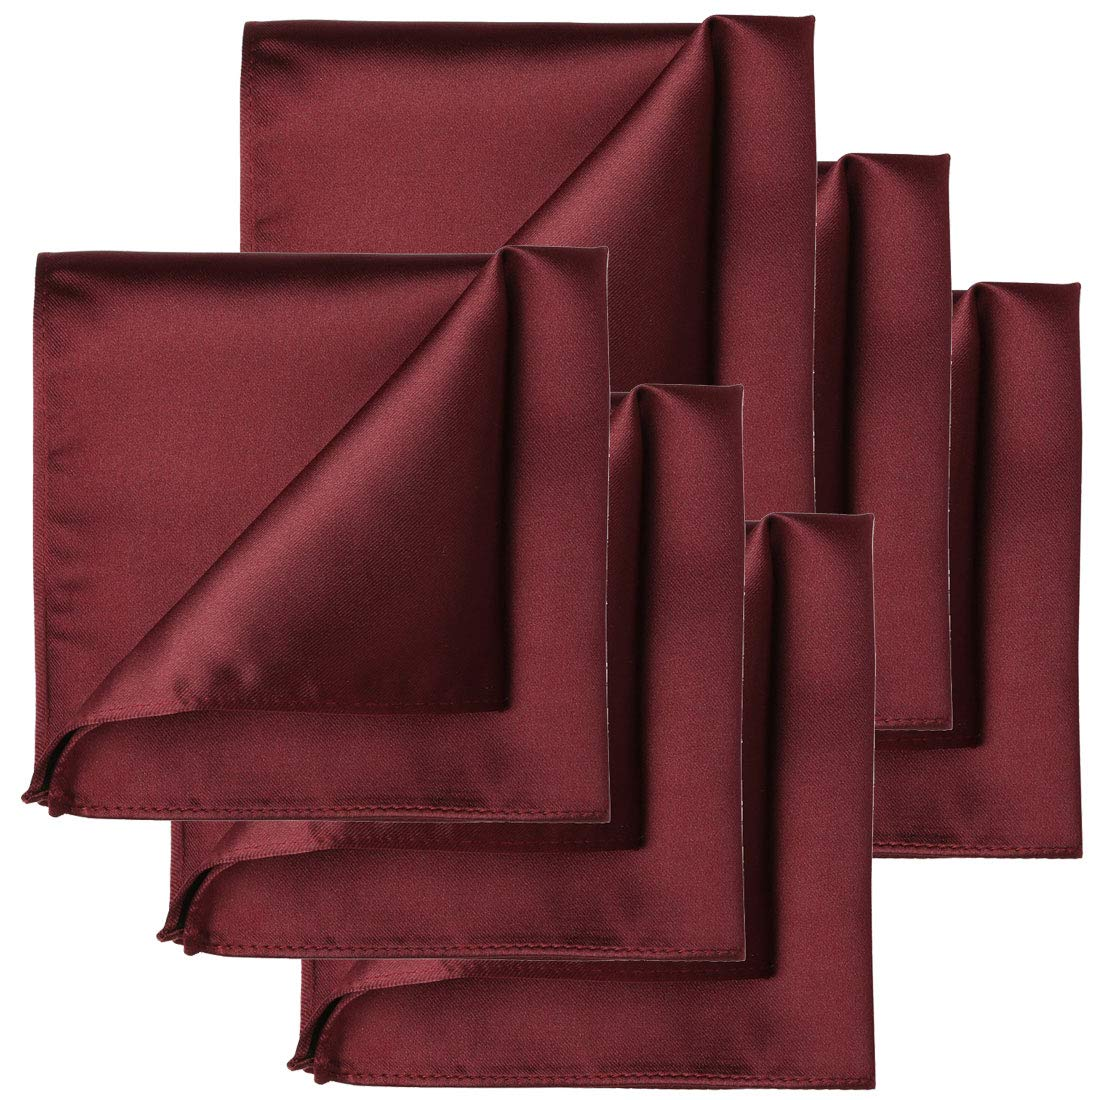 KissTies 6 PCS Burgundy Satin Pocket Square Solid Color Hankies Gift Set